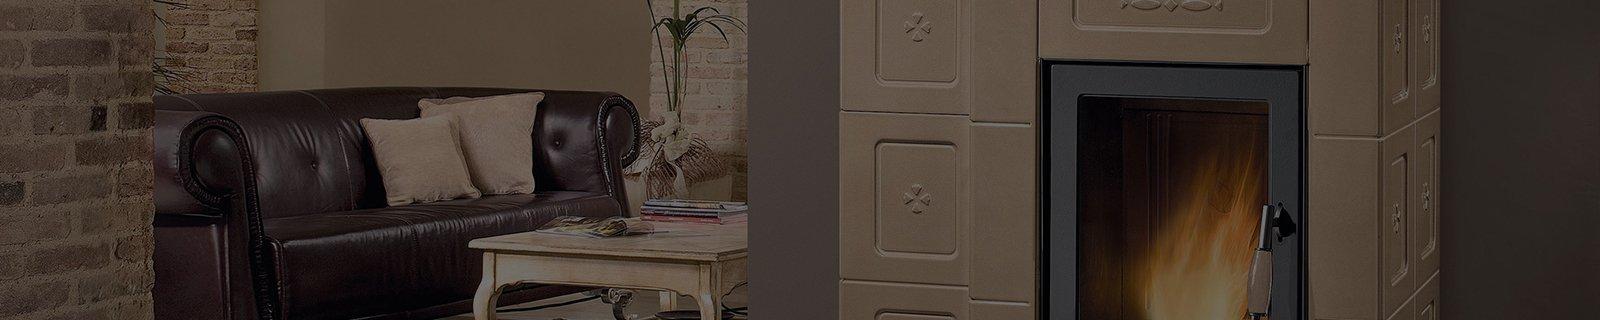 Камин в стиле кантри в интернет-магазине │ Kaminoff.ua